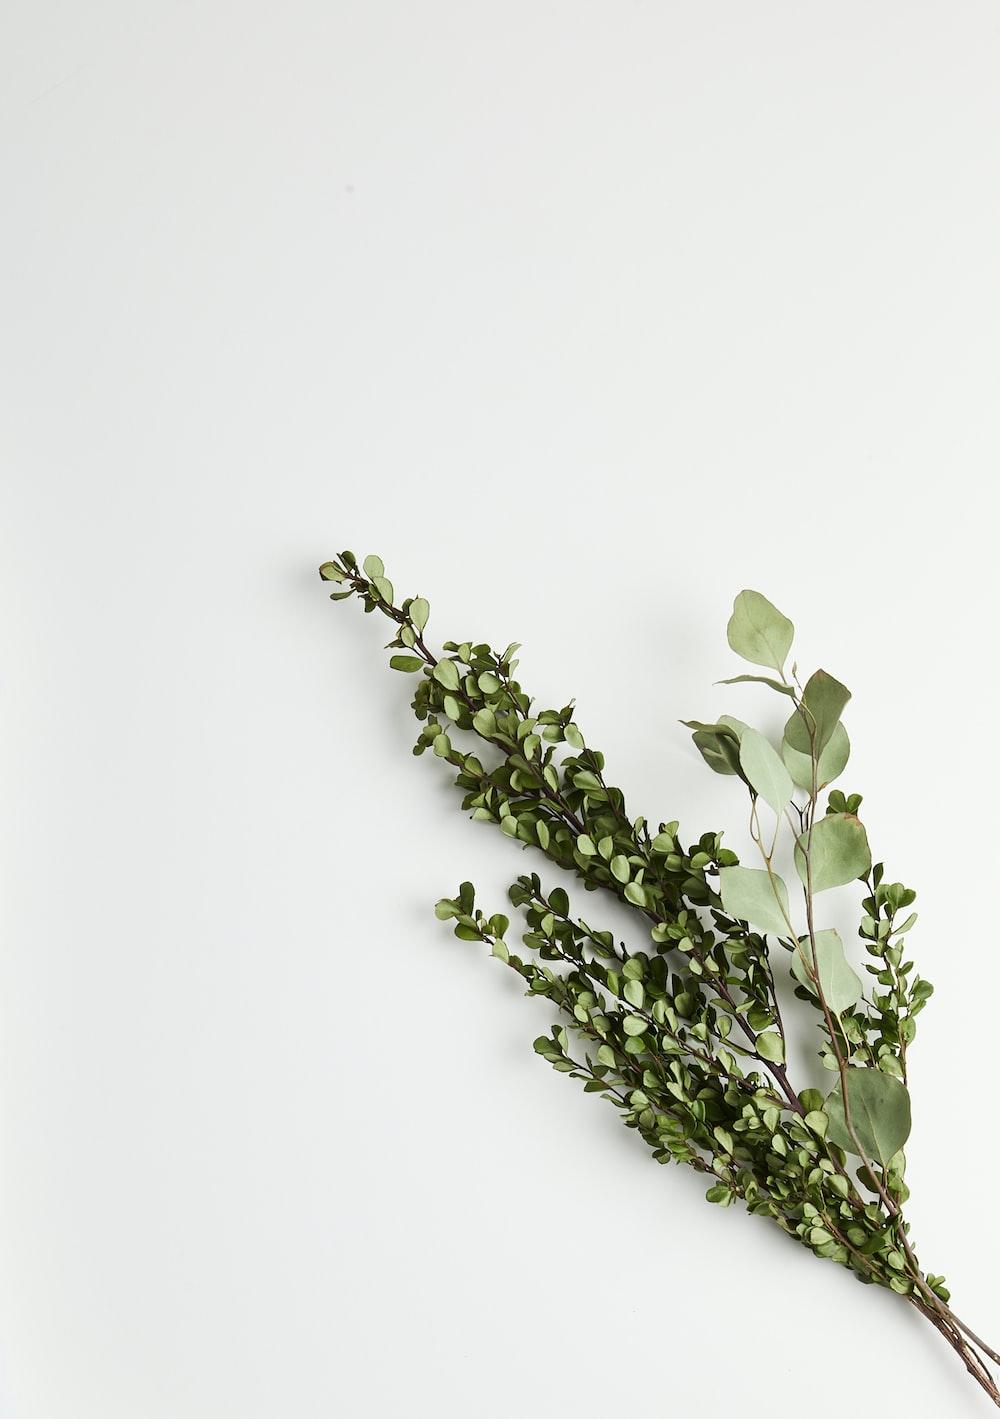 greeb leaf plants